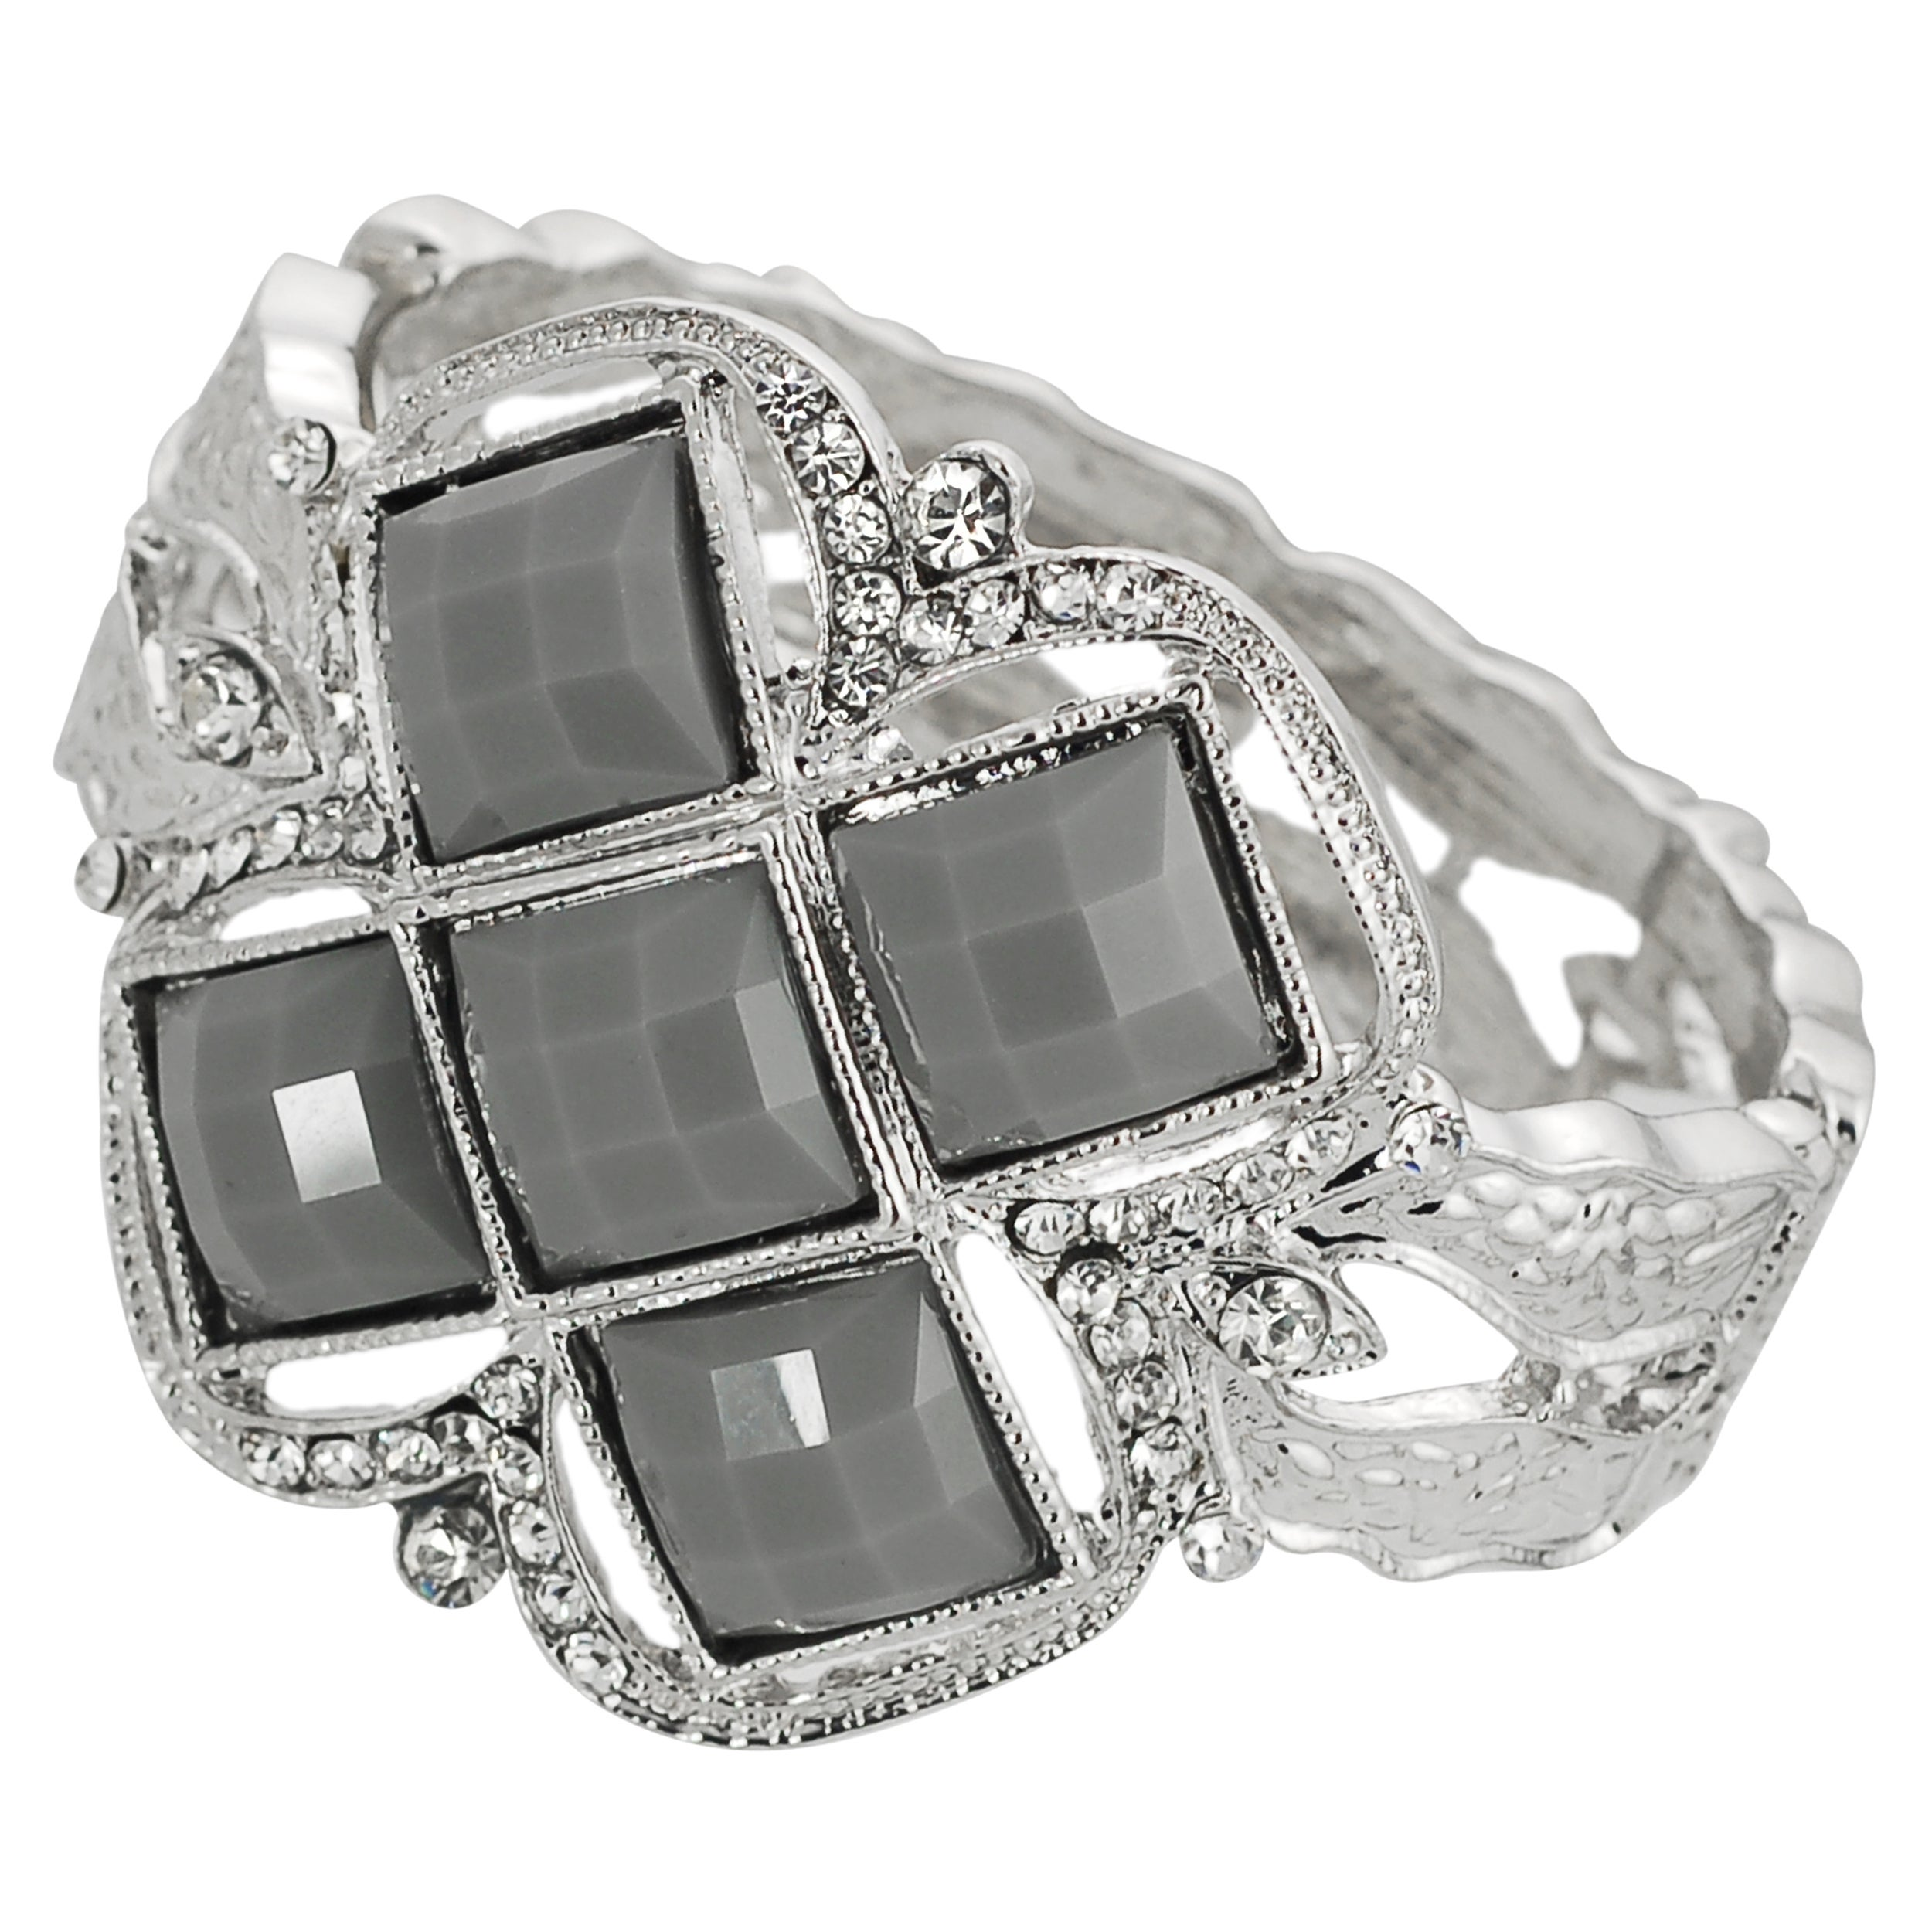 Journee Collection Silvertone Acrylic and Rhinestone Cuff Bracelet